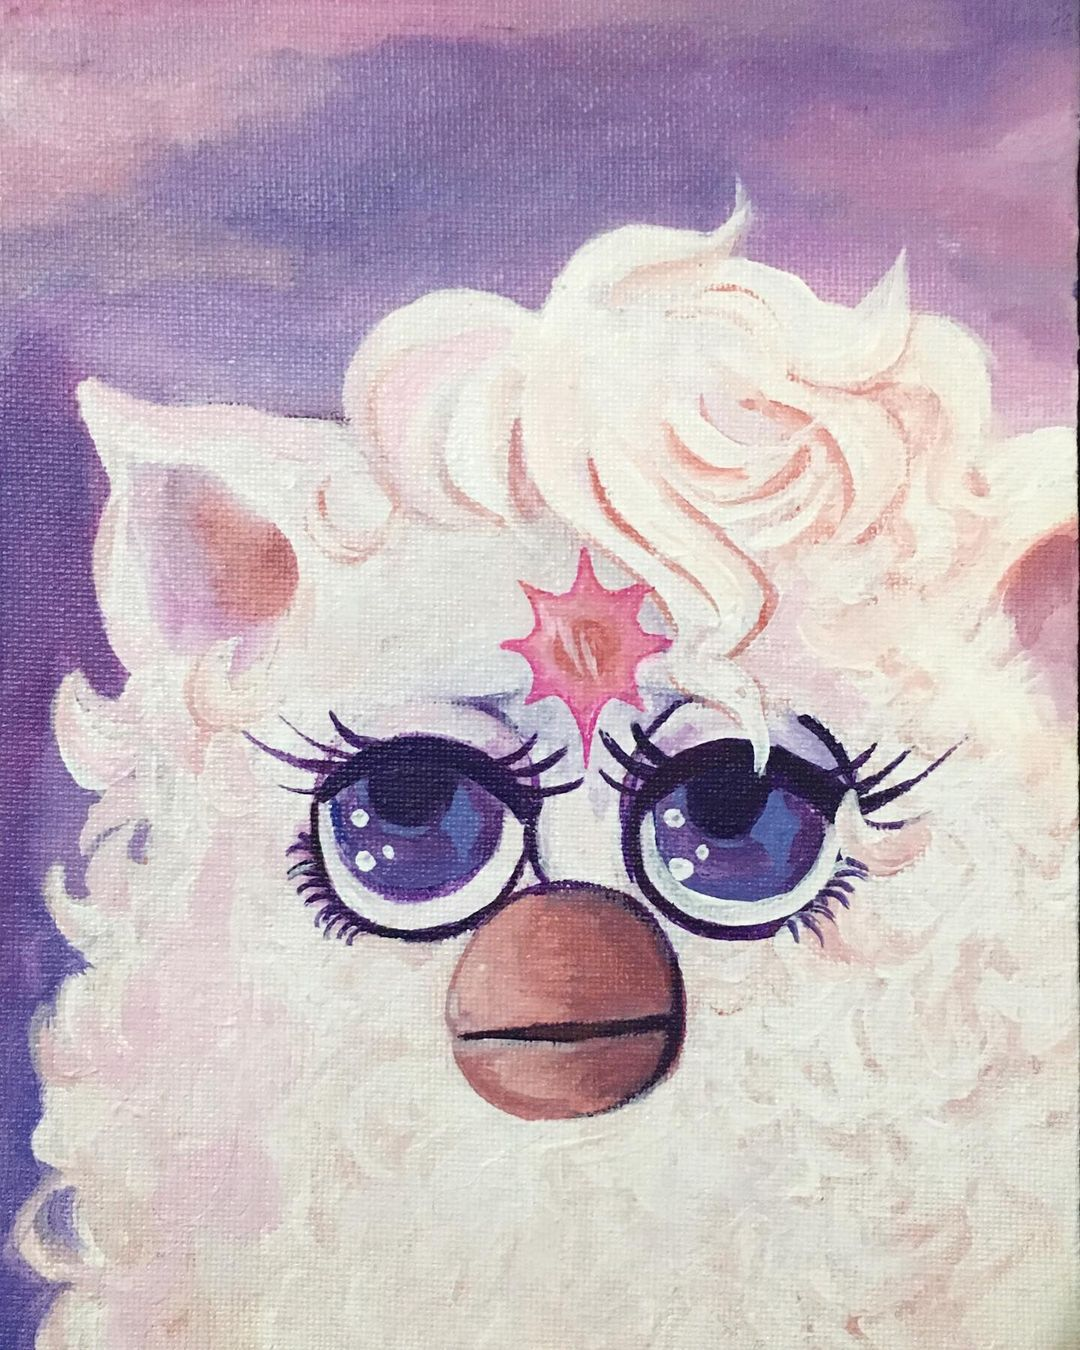 Last Unicorn Furby Original Painting In 2021 Original Paintings Furby Painting